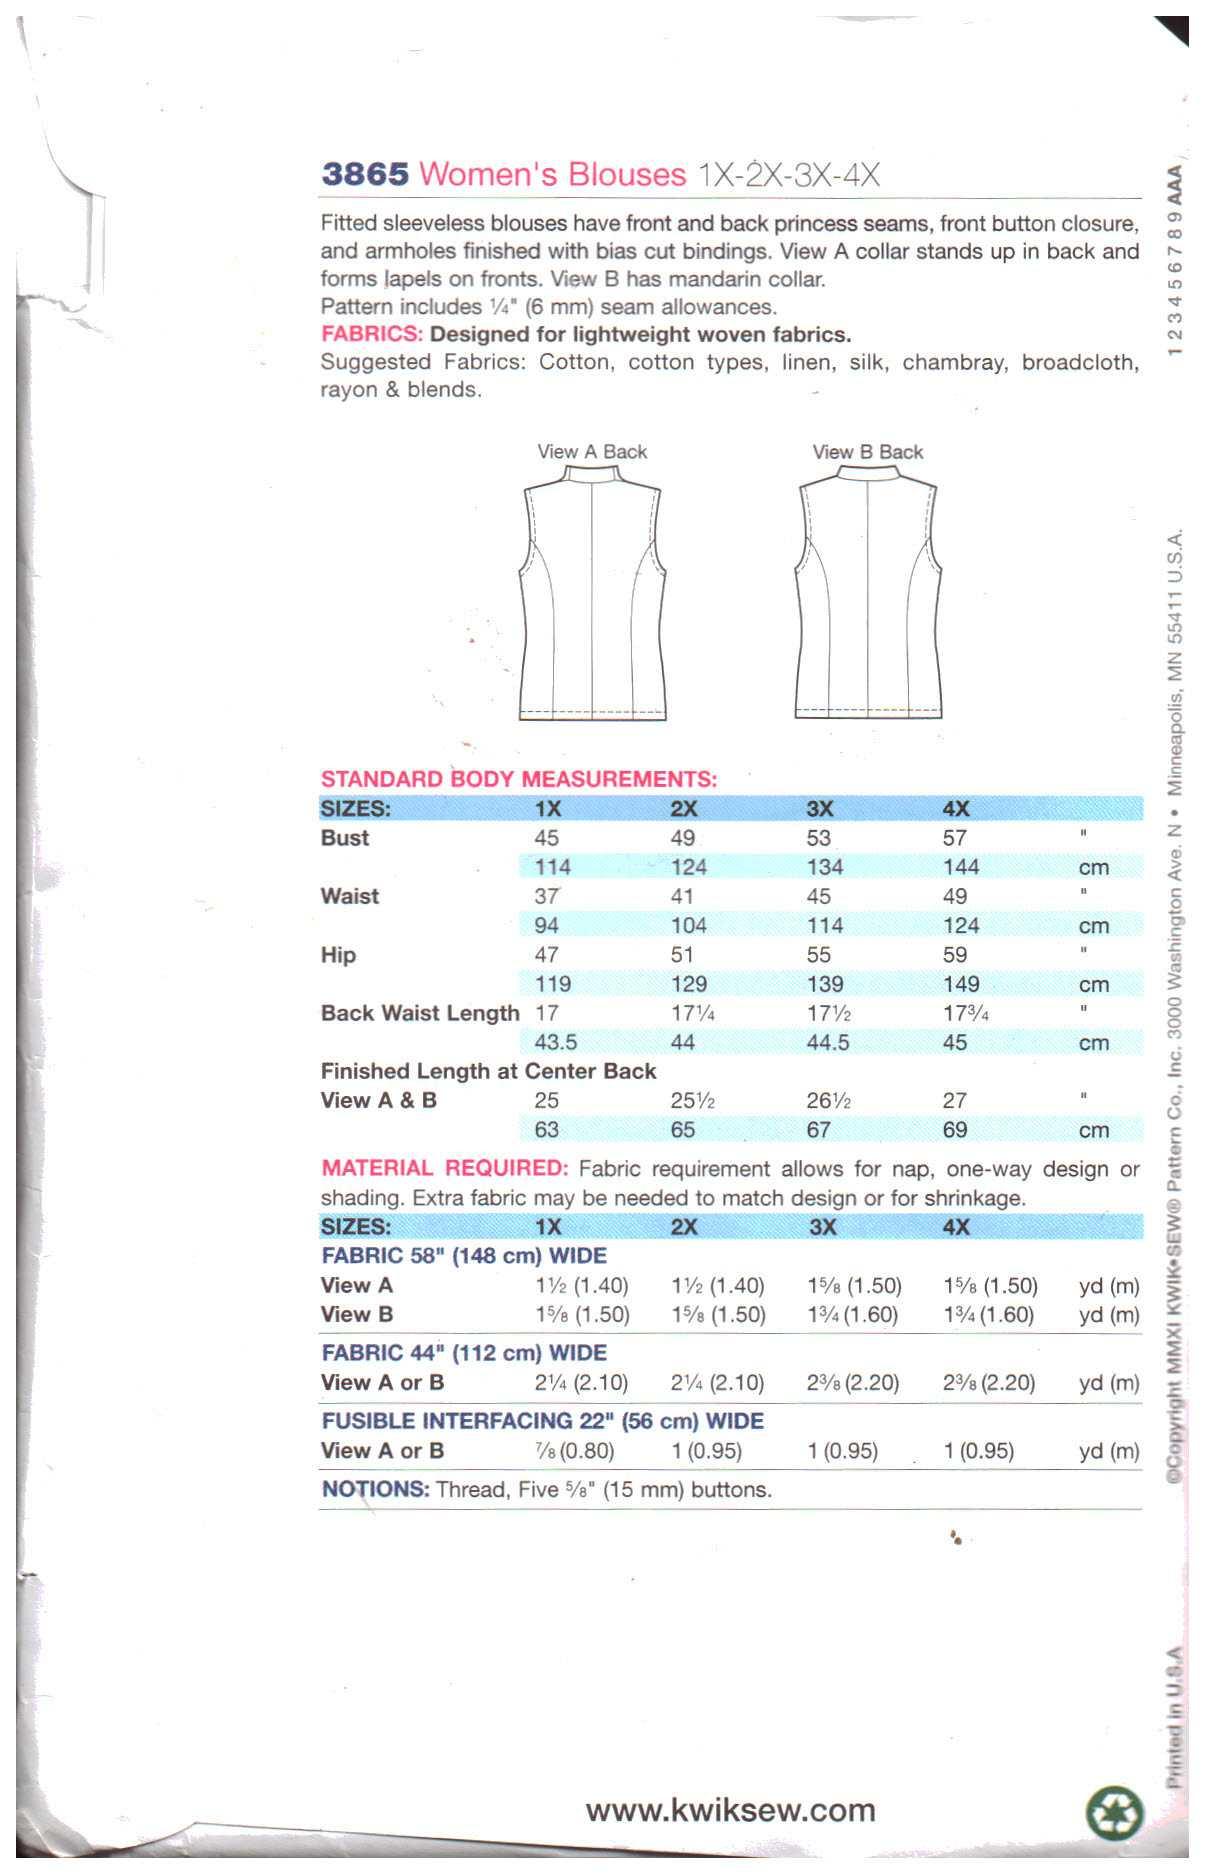 5ab98491634fc Kwik Sew 3865 Blouse Size  1X-2X-3X-4X Used Sewing Pattern